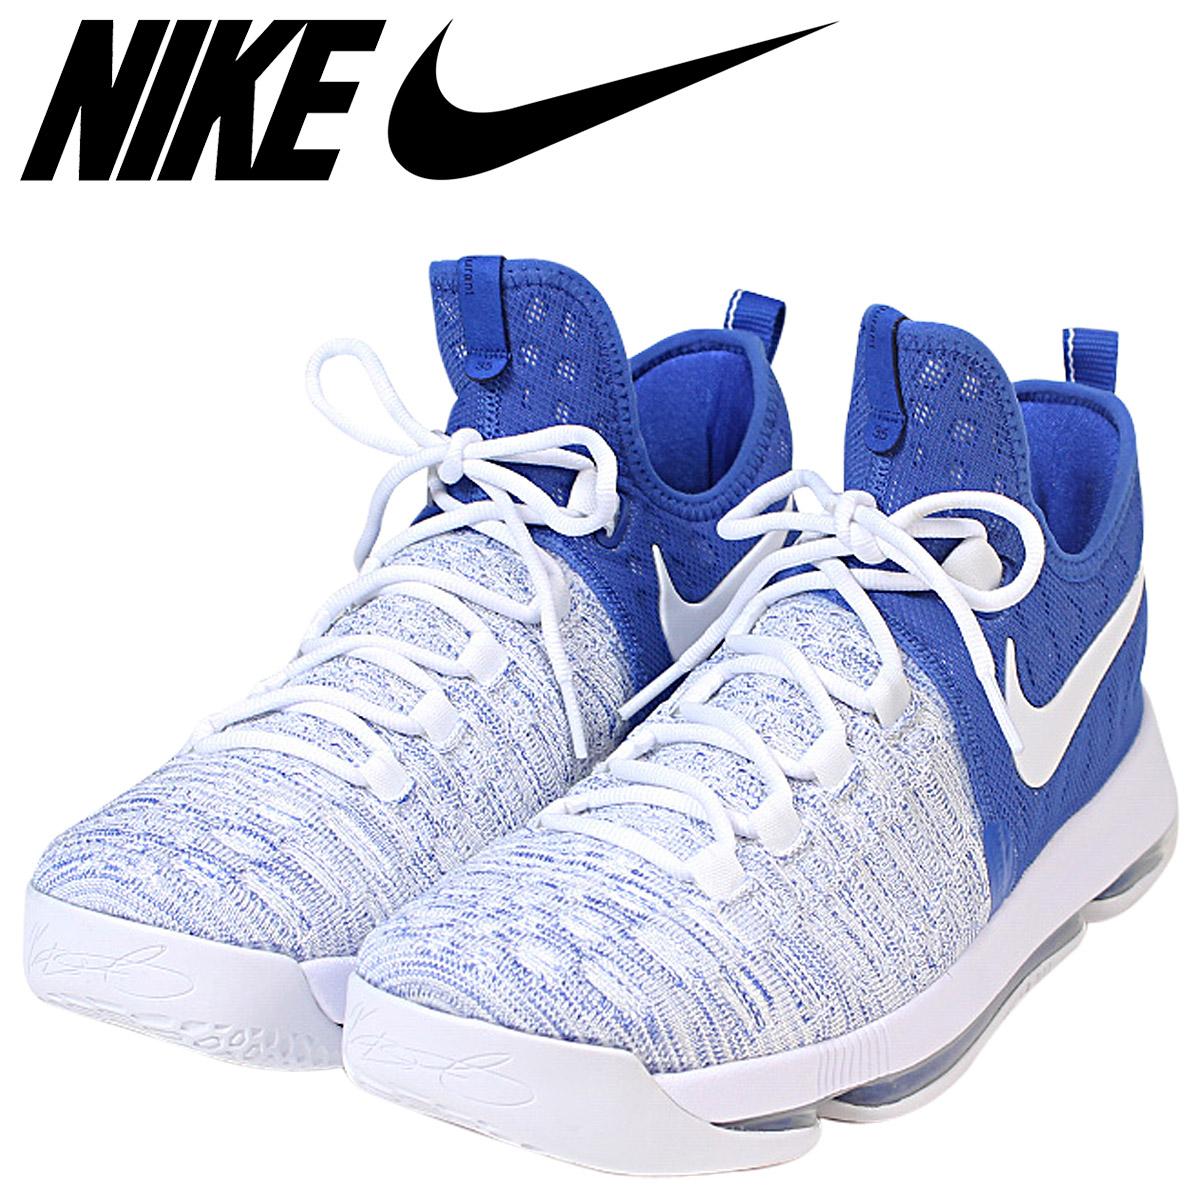 aa63b7b8b7 ... reduced nike nike zoom kd9 sneakers zoom kd 9 ep game royal men 844382  411 kevin